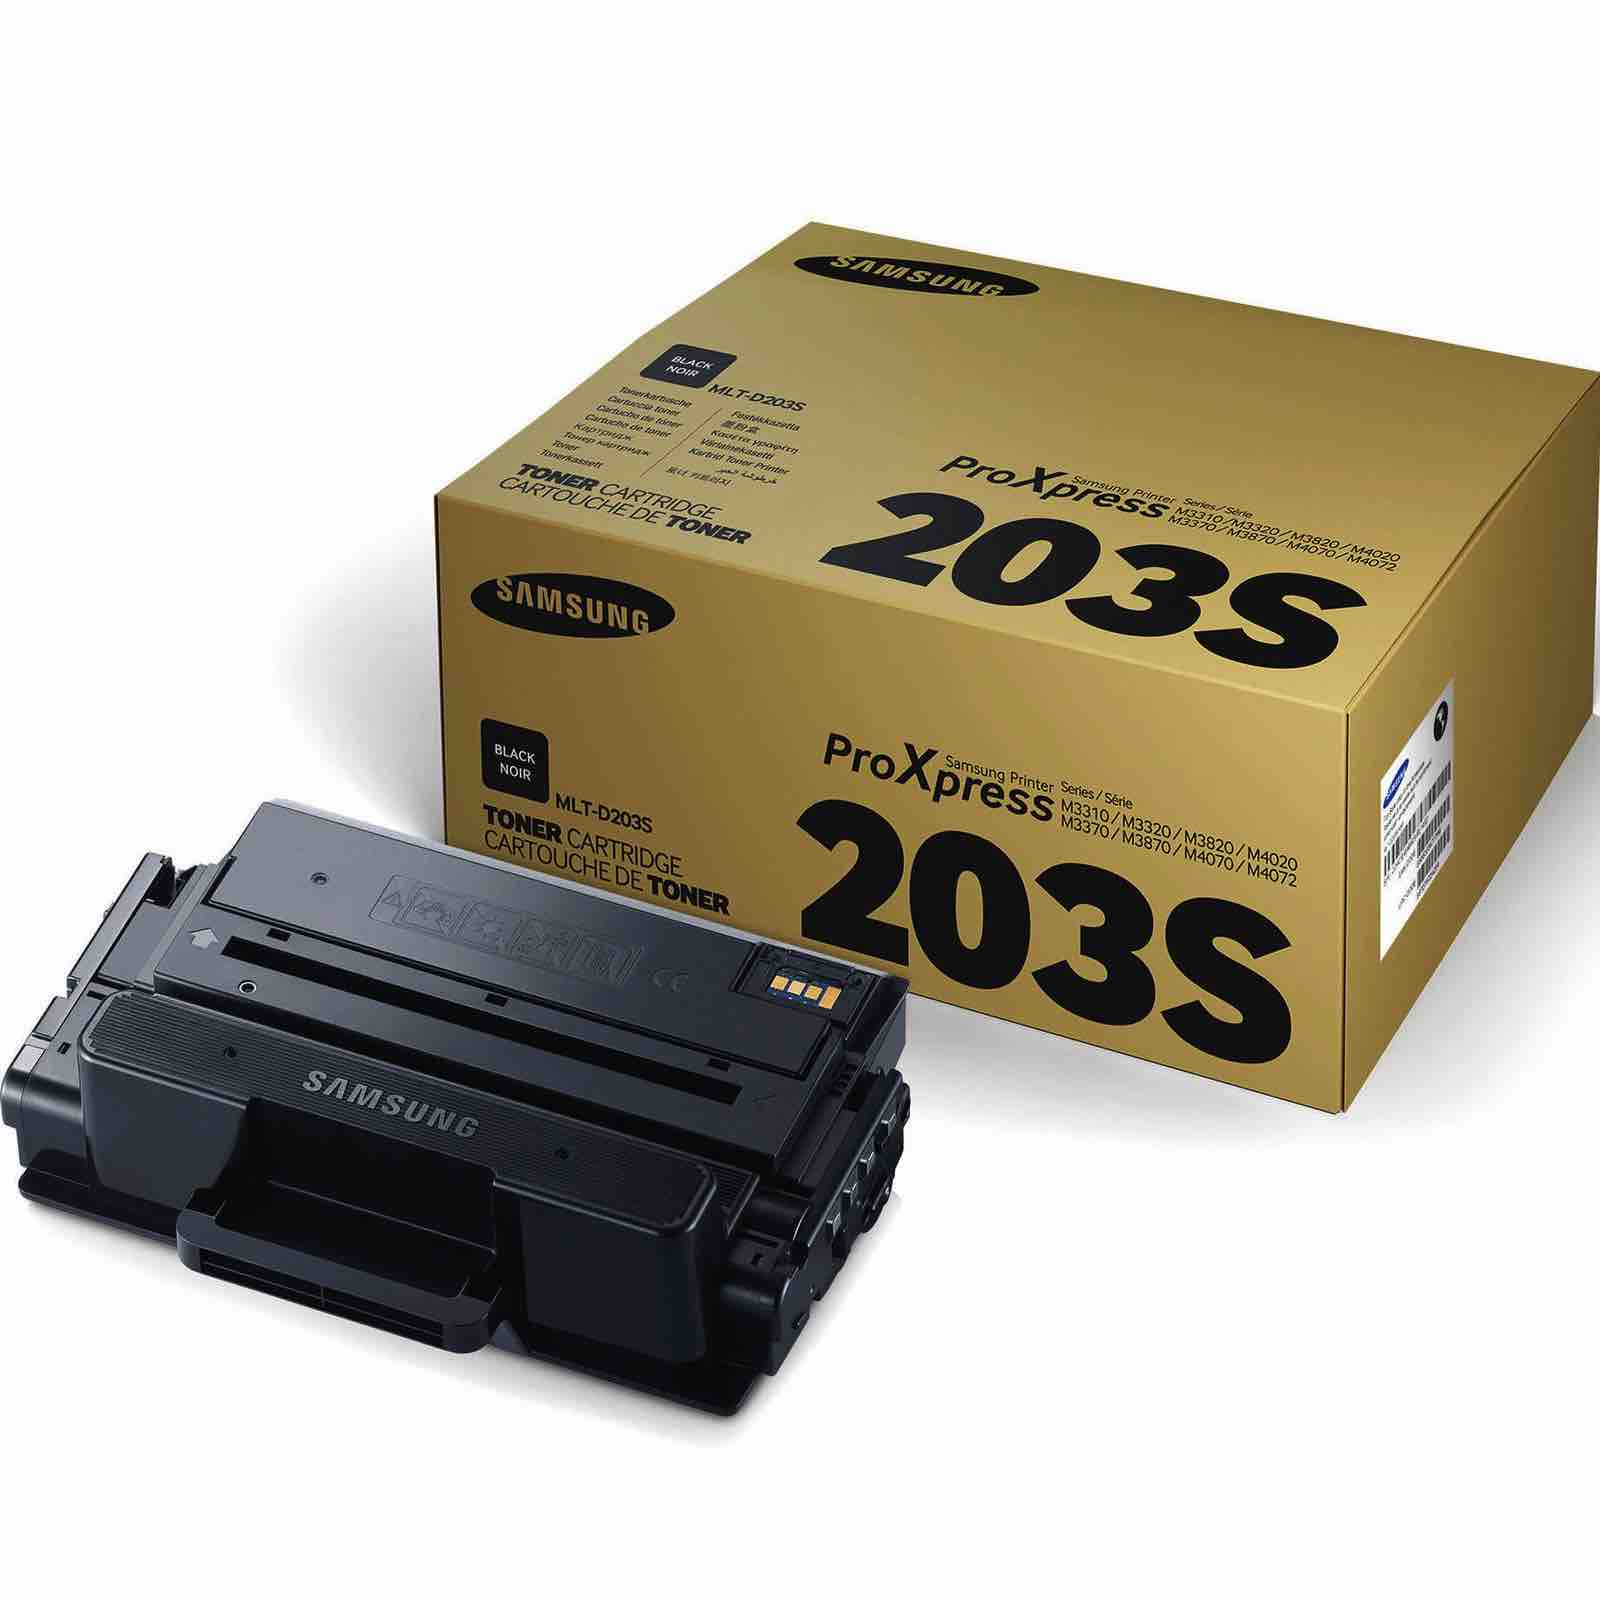 Заправка картриджа MLT-D203S для Samsung Xpress M4020